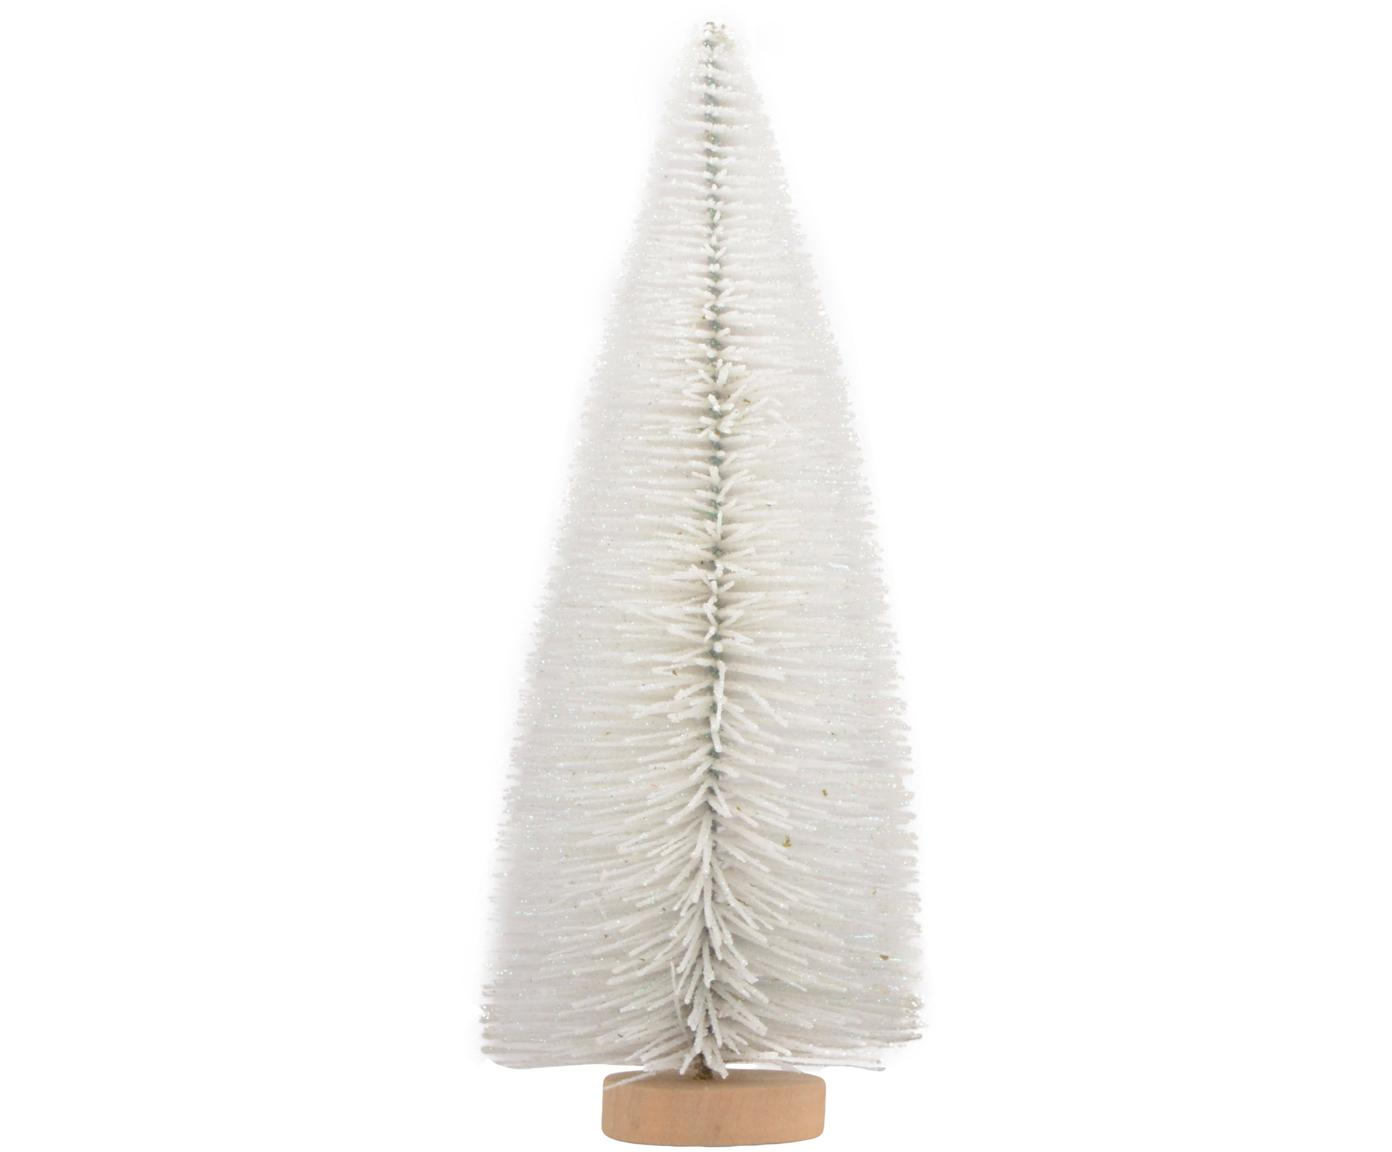 Oggetto decorativo Christmas Tree, Metallo, Bianco, marrone chiaro, Ø 8 x Alt. 20 cm